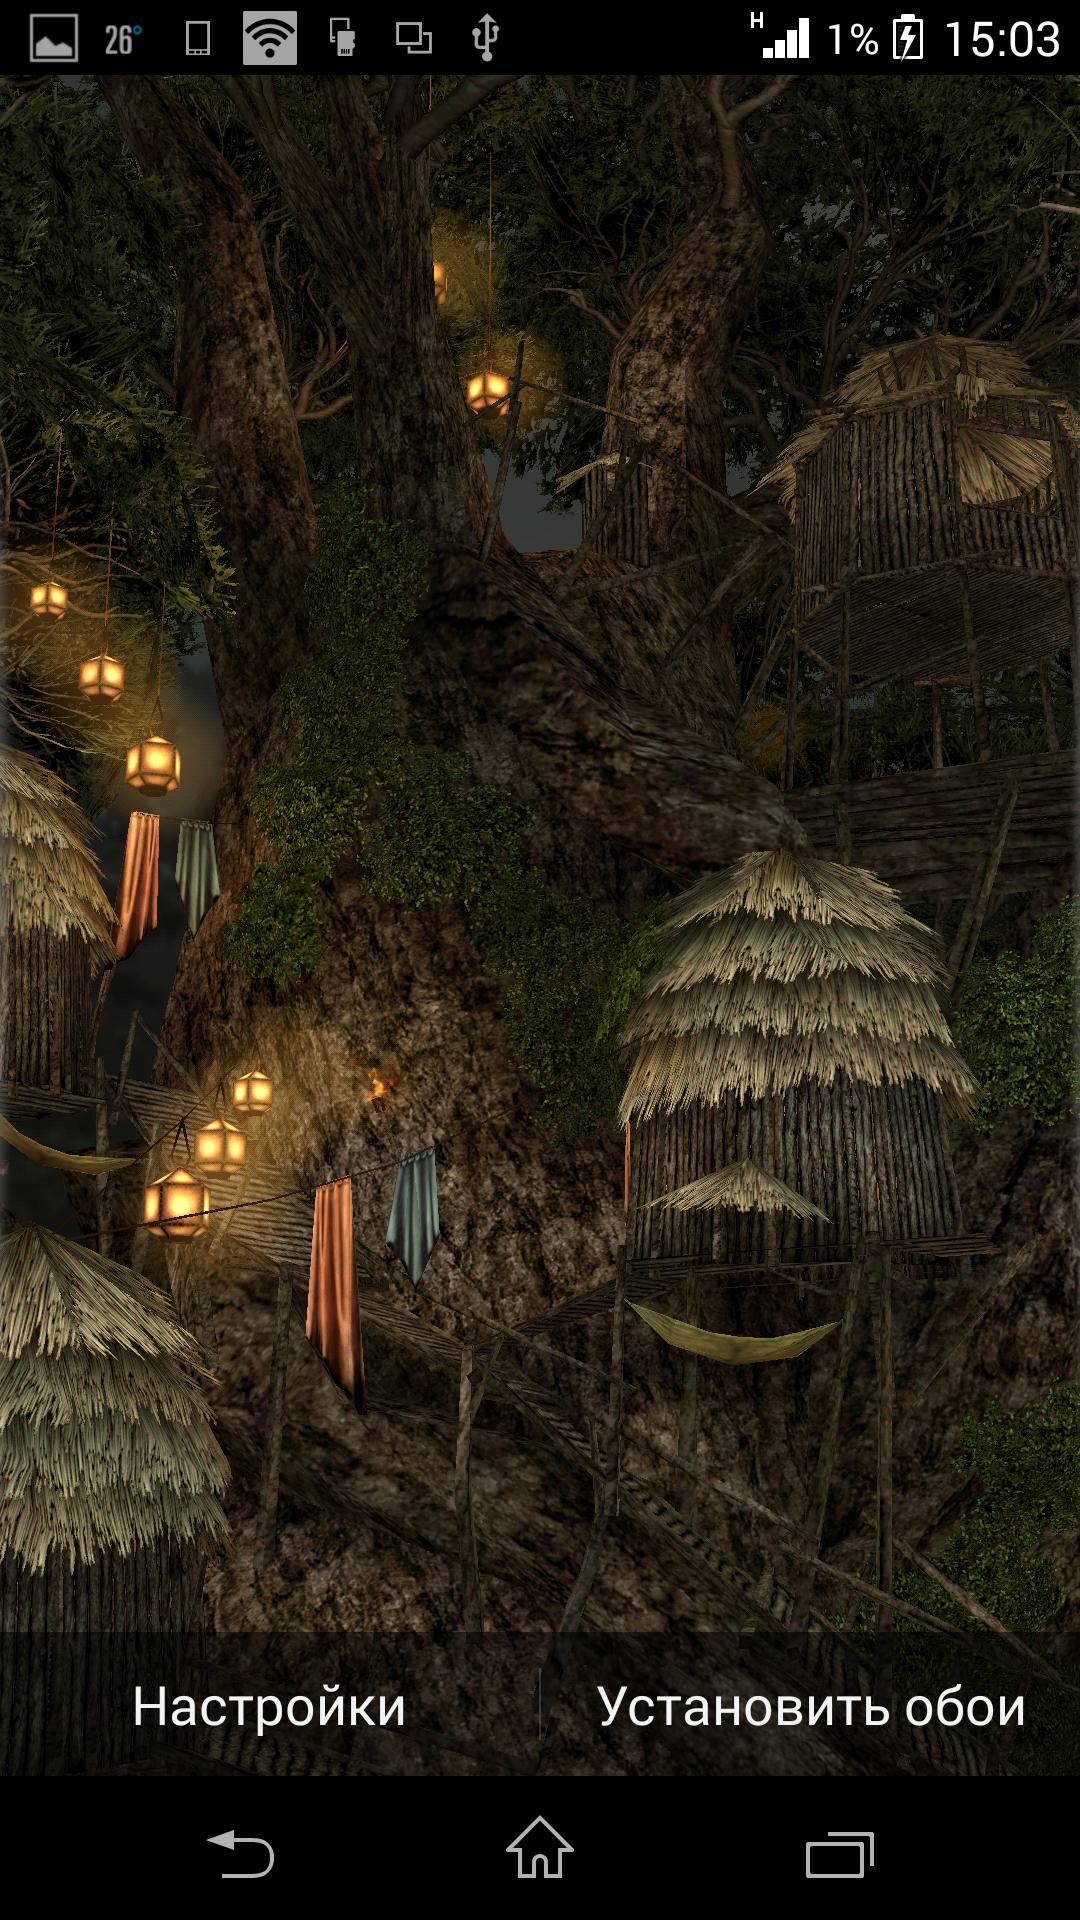 Превью - Magic Tree 3D Live Wallpaper для Android